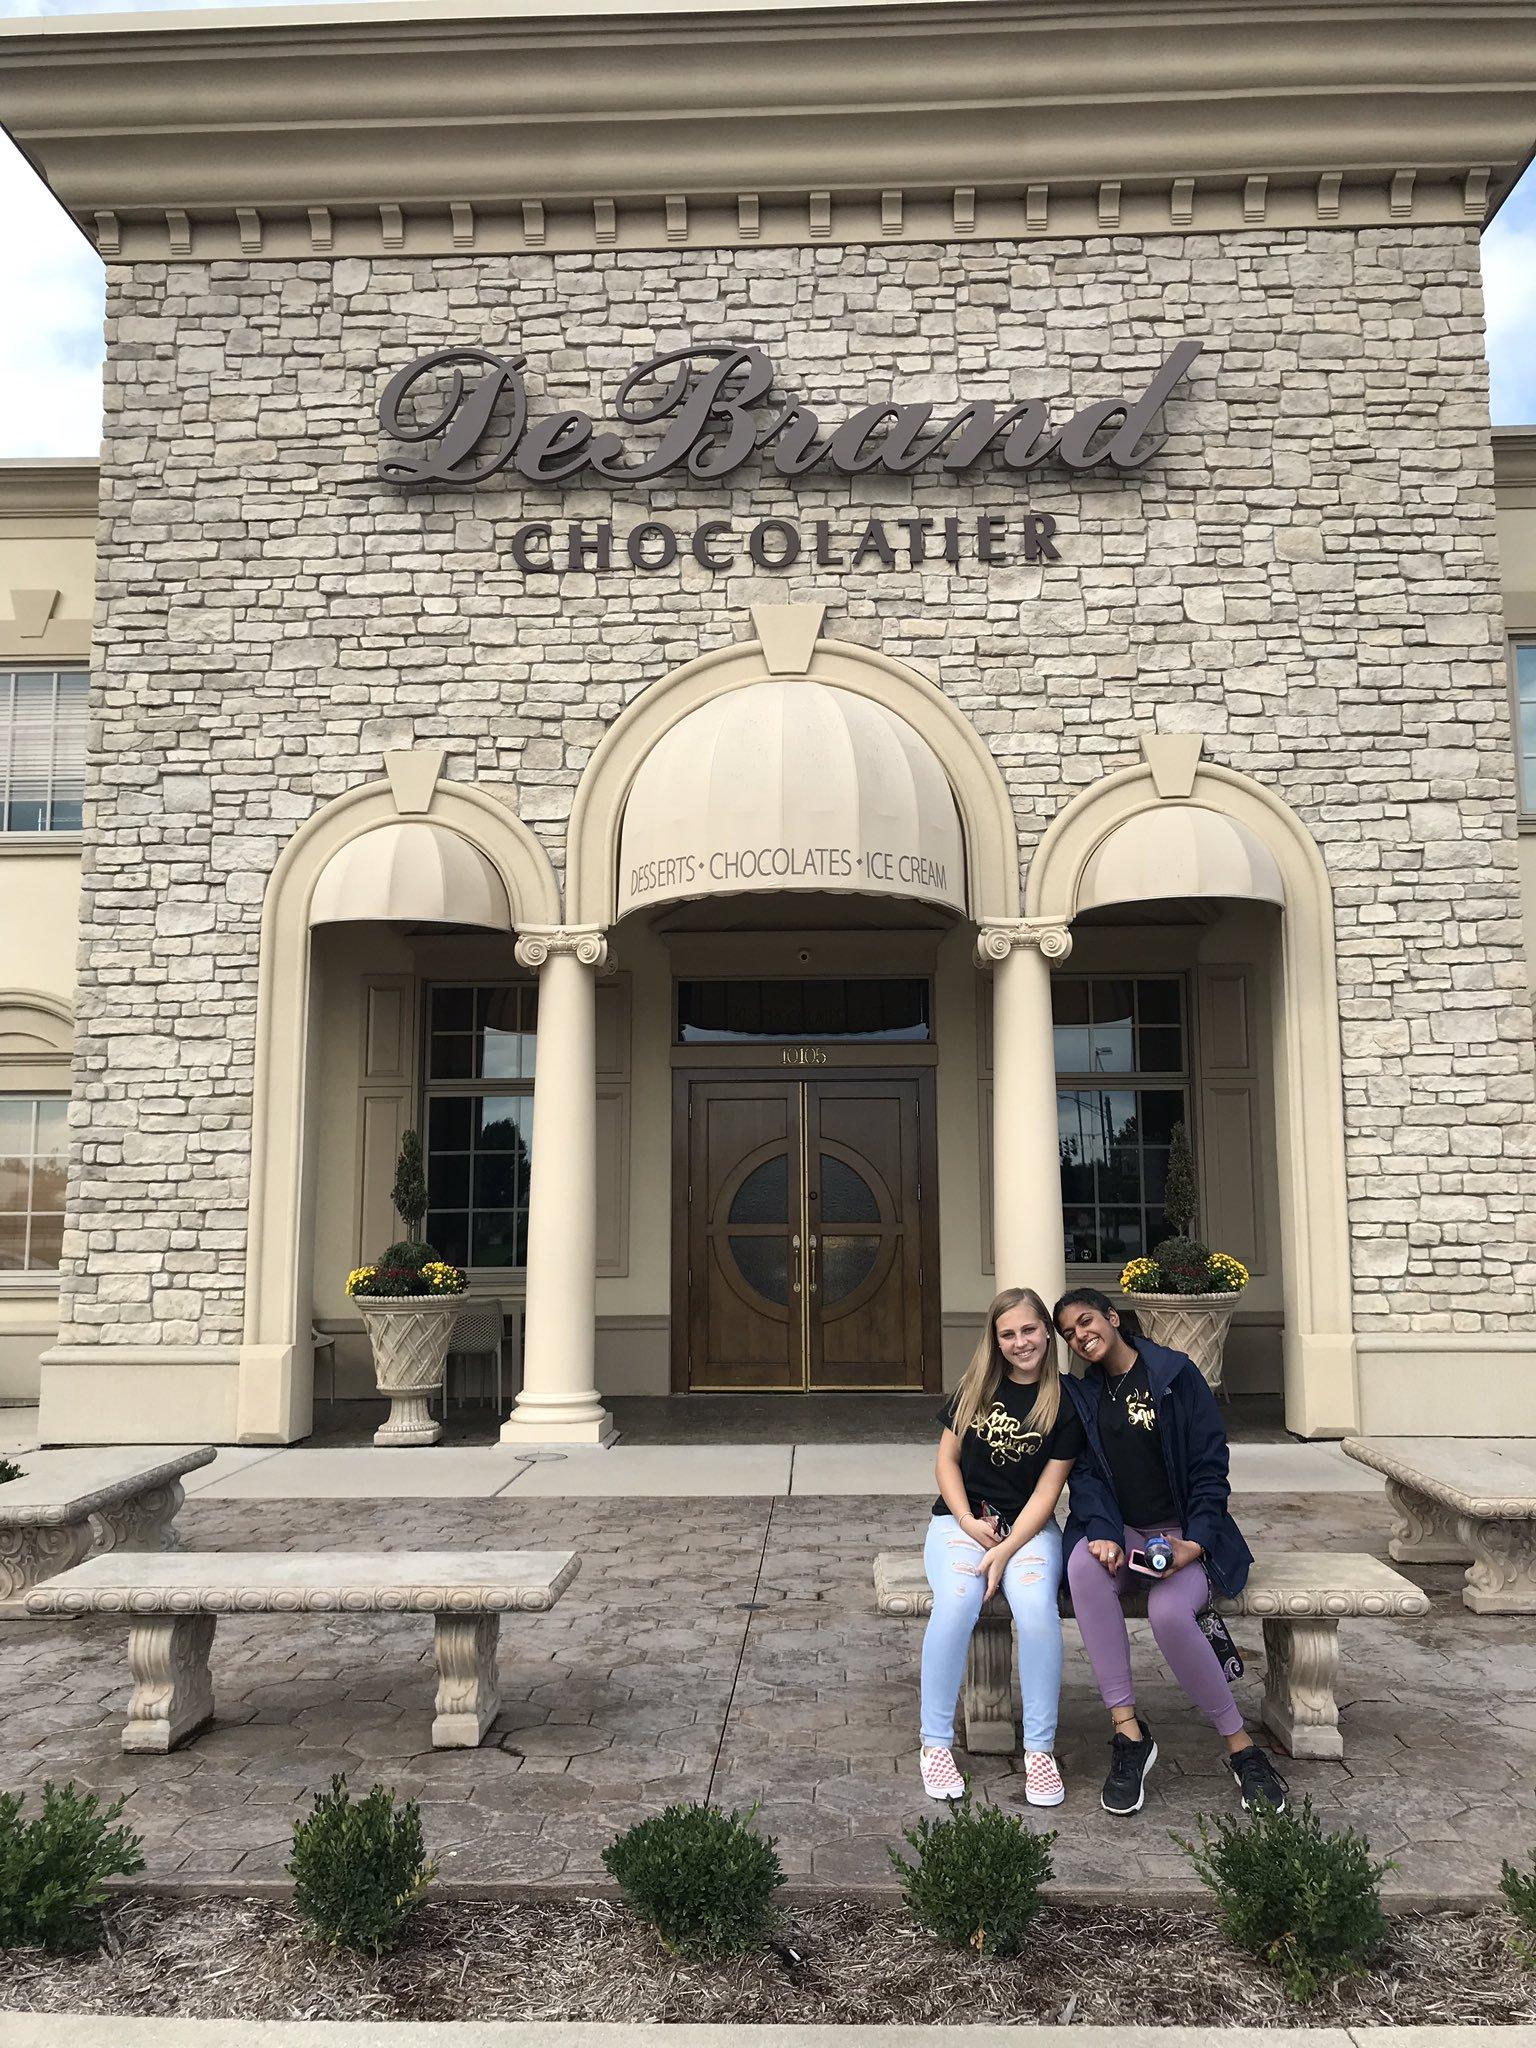 DeBrand-Chocolate